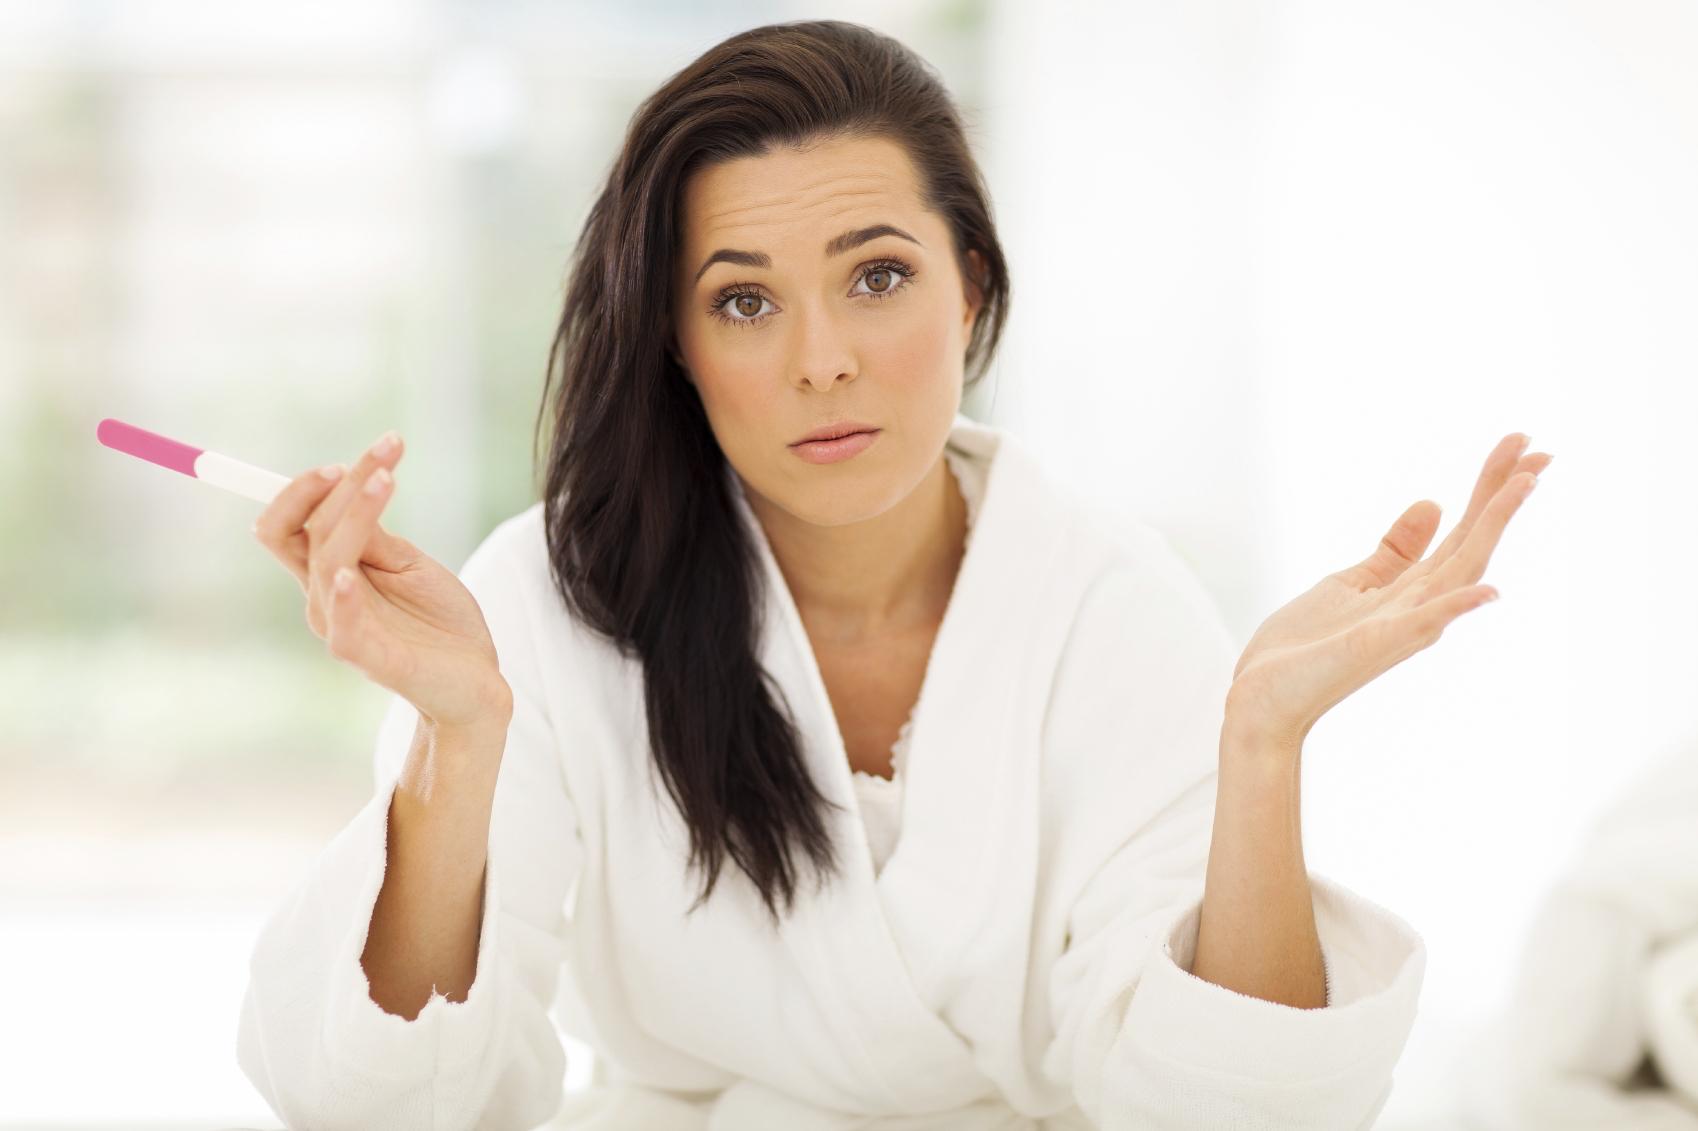 Negativ graviditetstest men ømme bryster